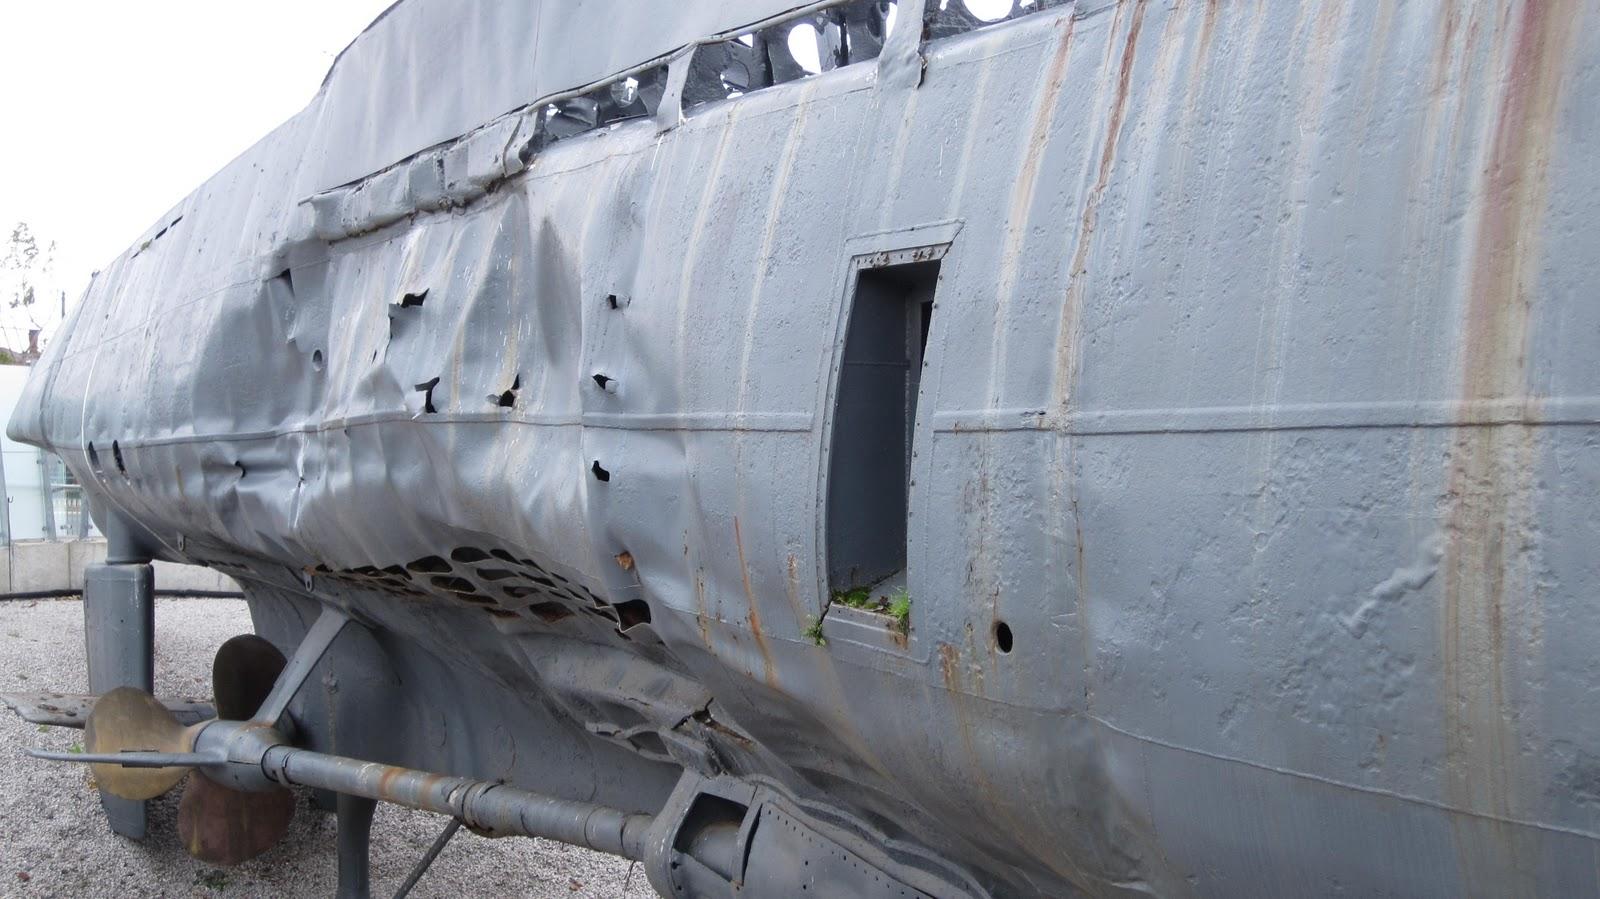 Car Wax Near Me >> Coastal Rail Journeys; UK and near Europe: Sunlight and Submarines